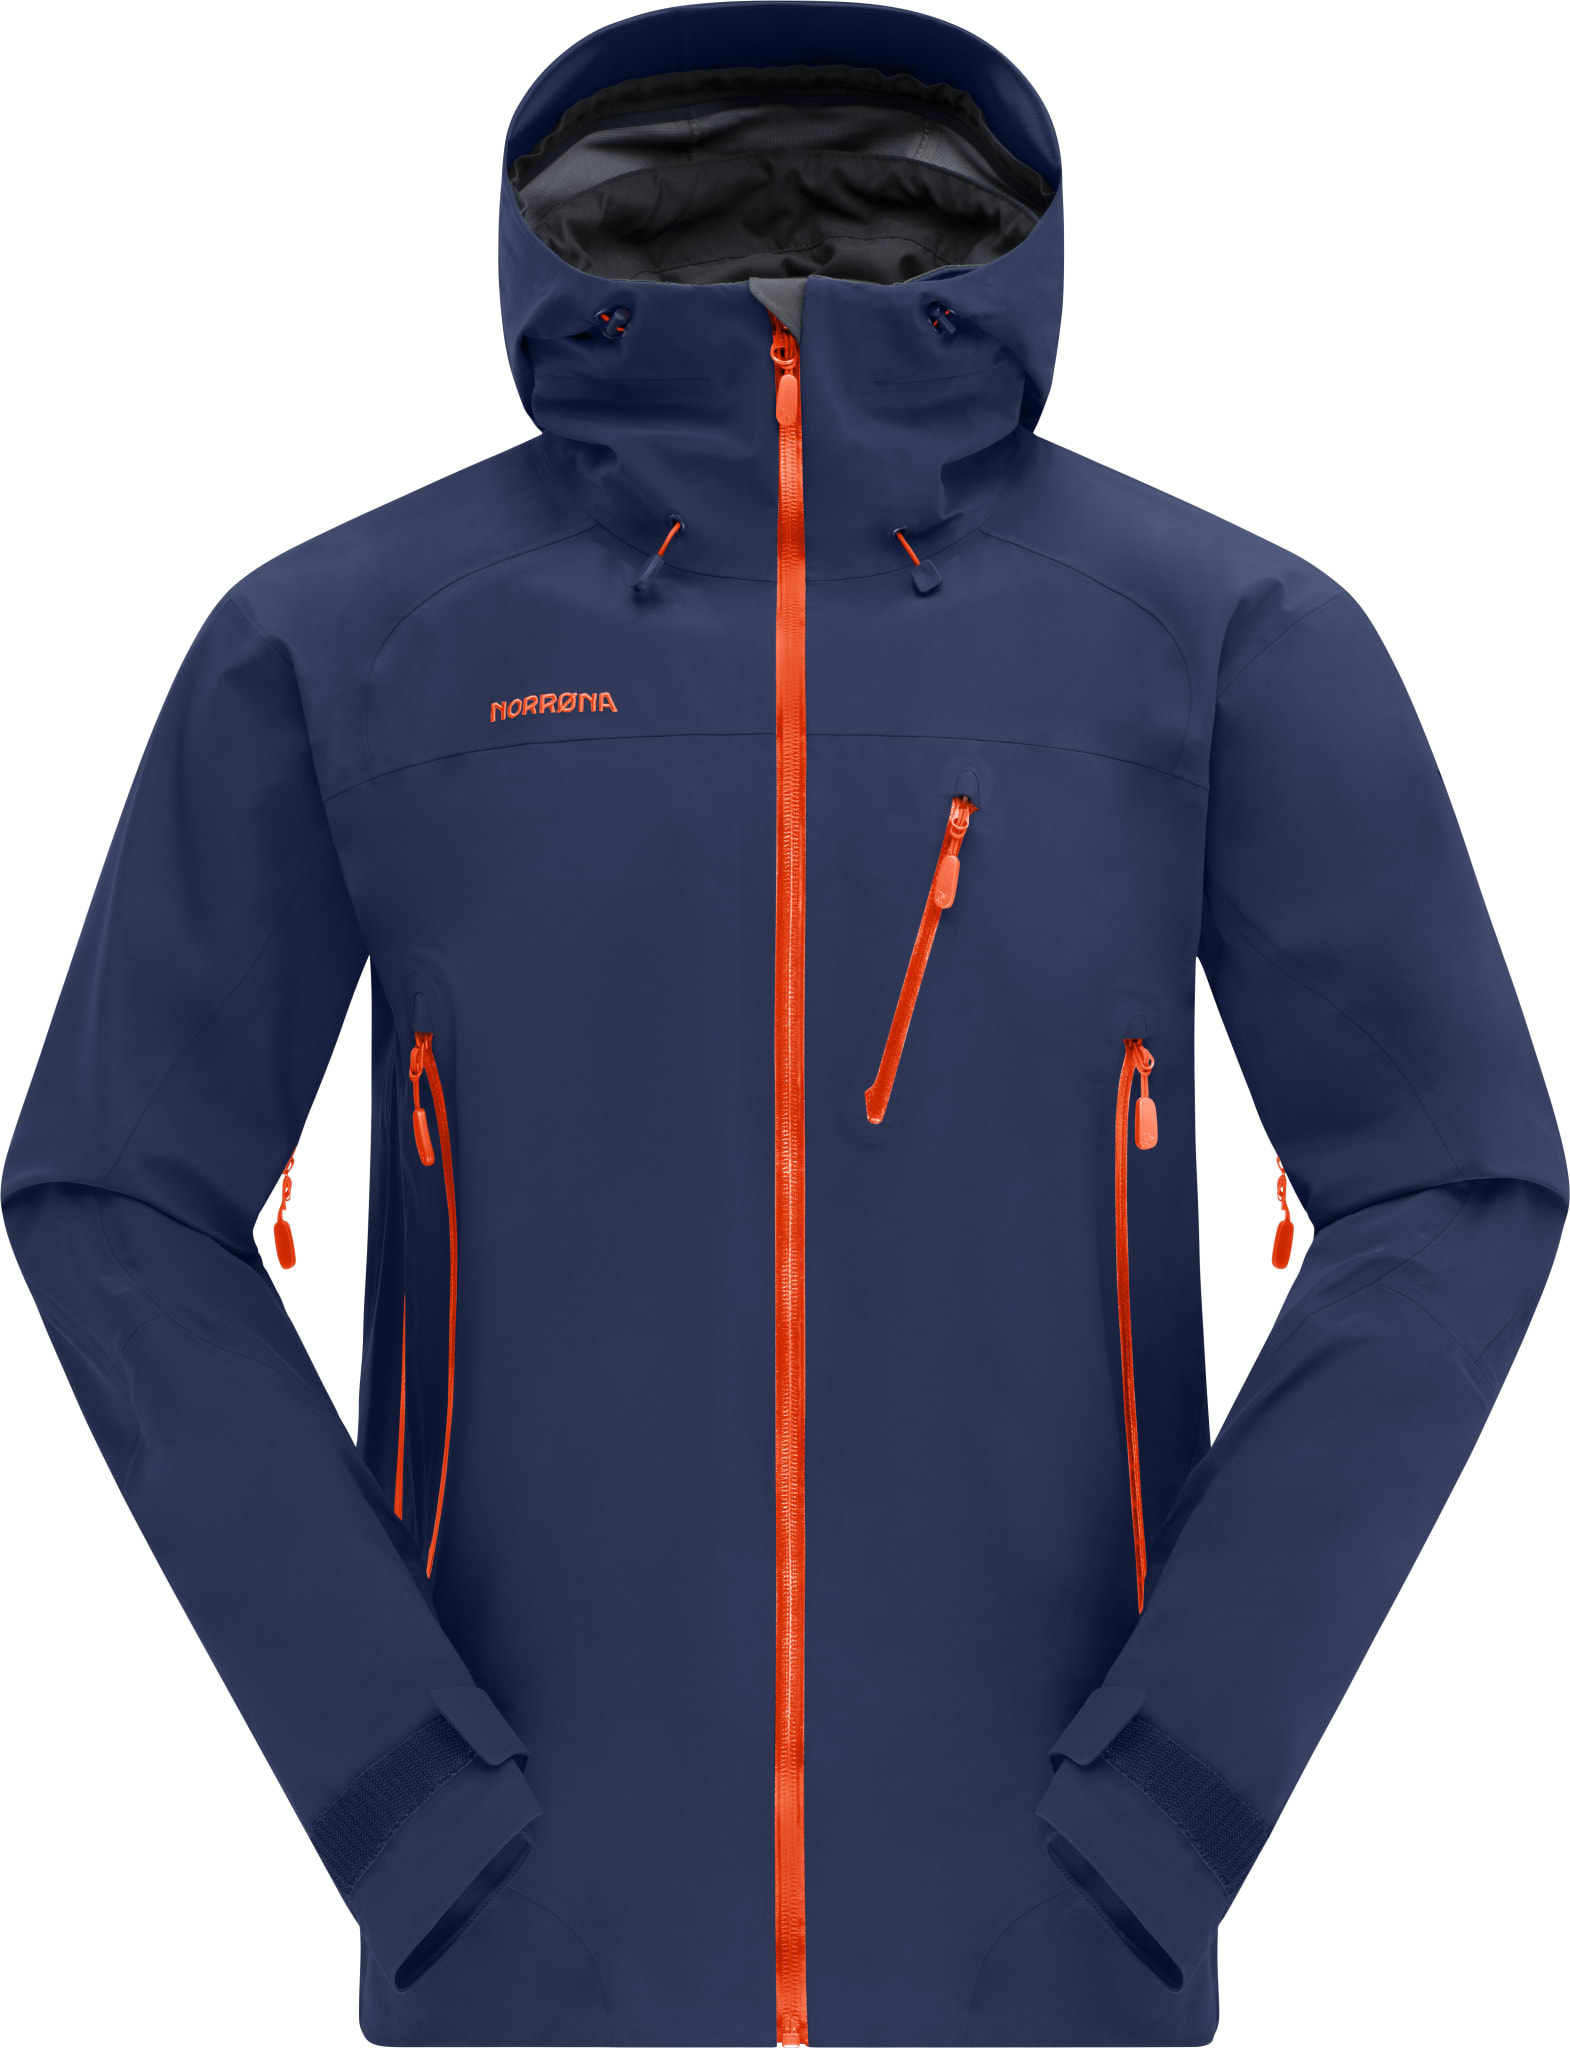 Trollveggen Driflex3 Jacket M